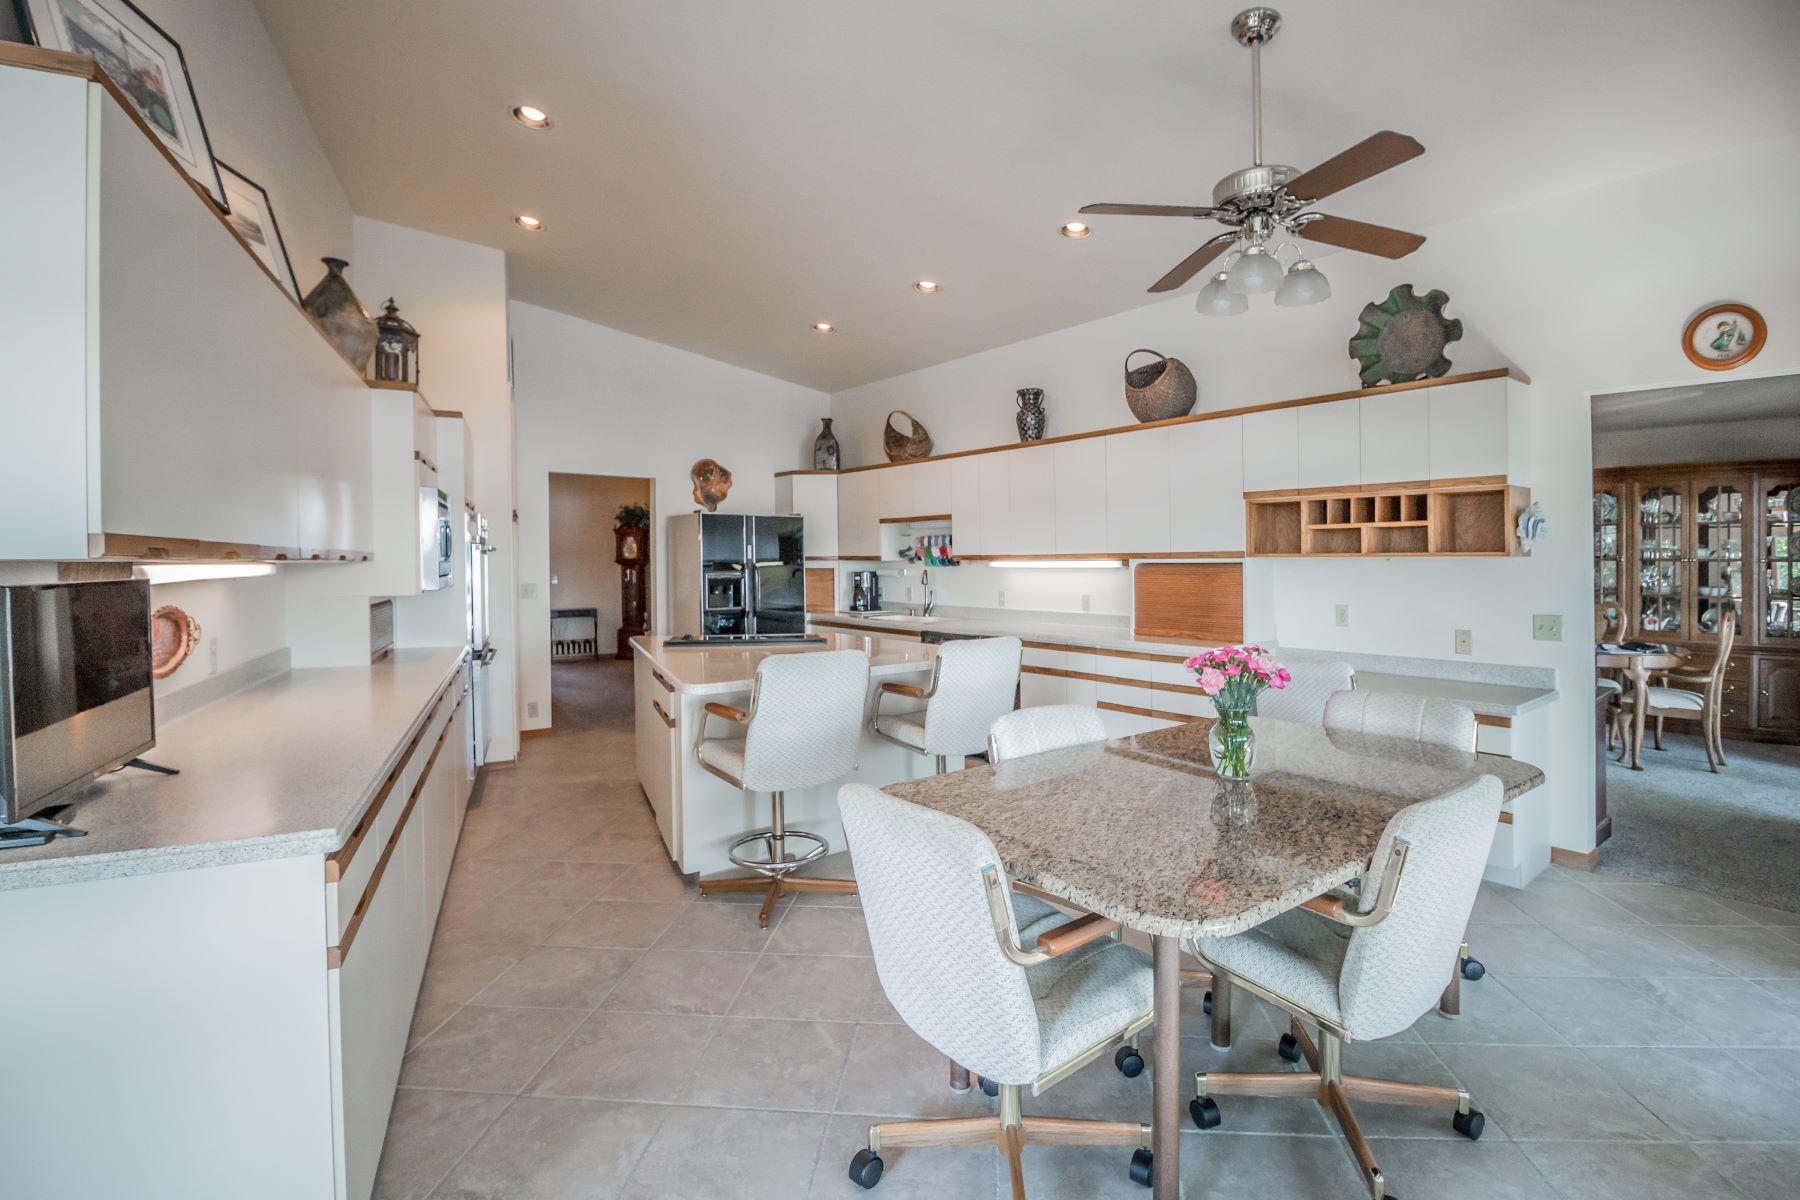 Additional photo for property listing at  Rogers, Arkansas 72756 Förenta staterna